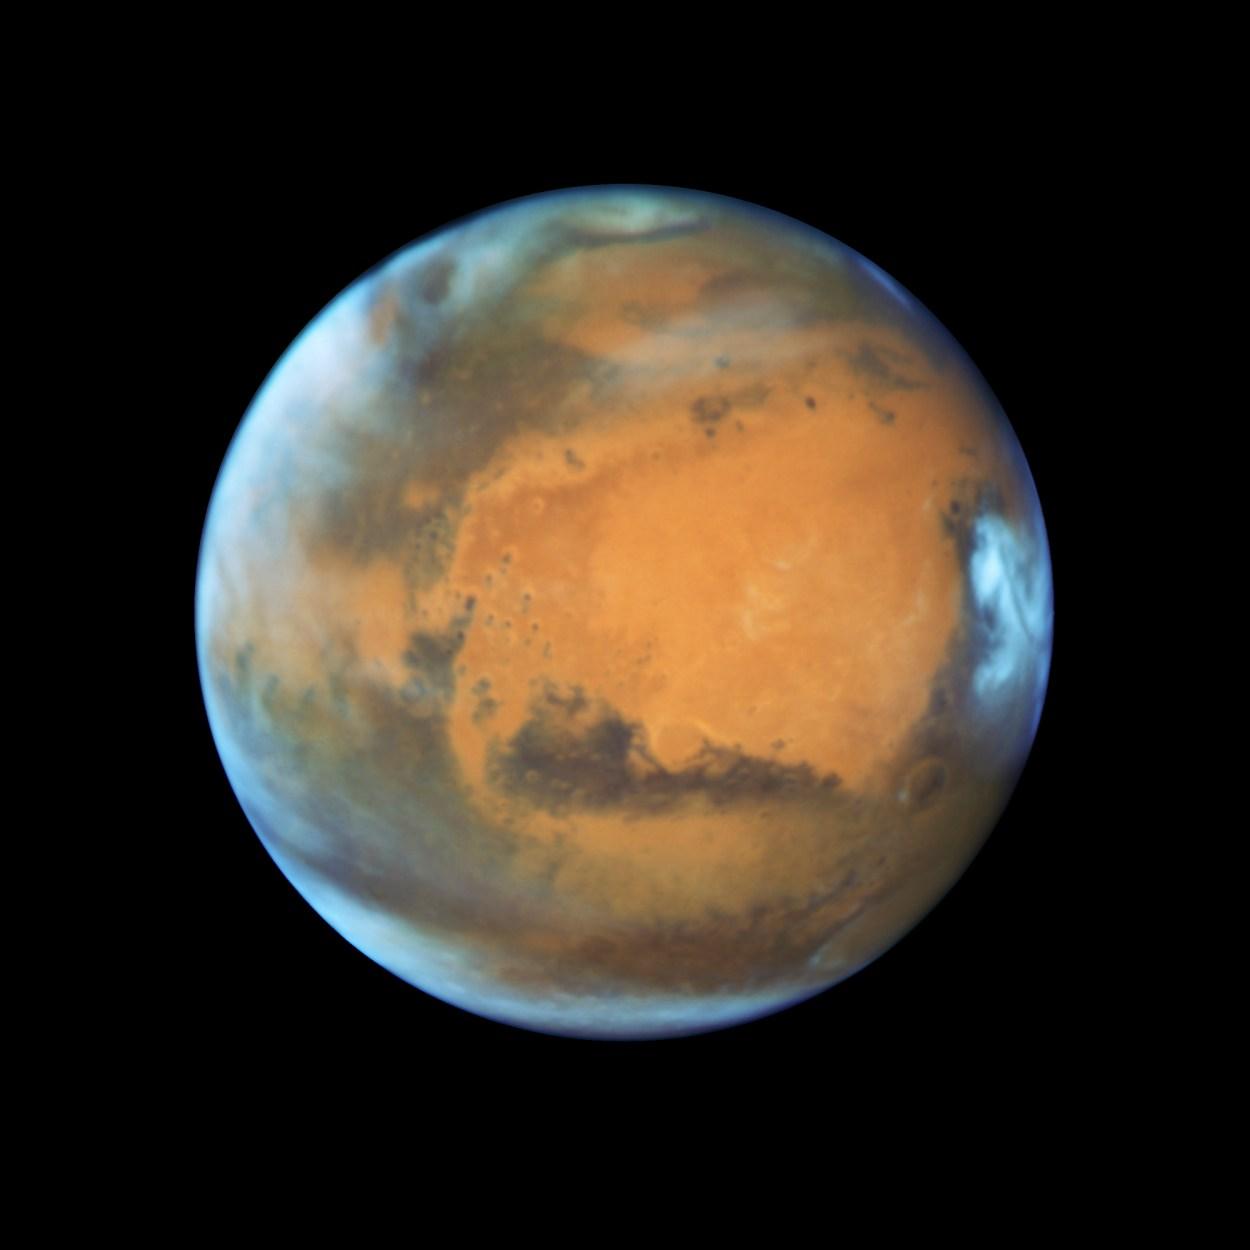 New Mars image